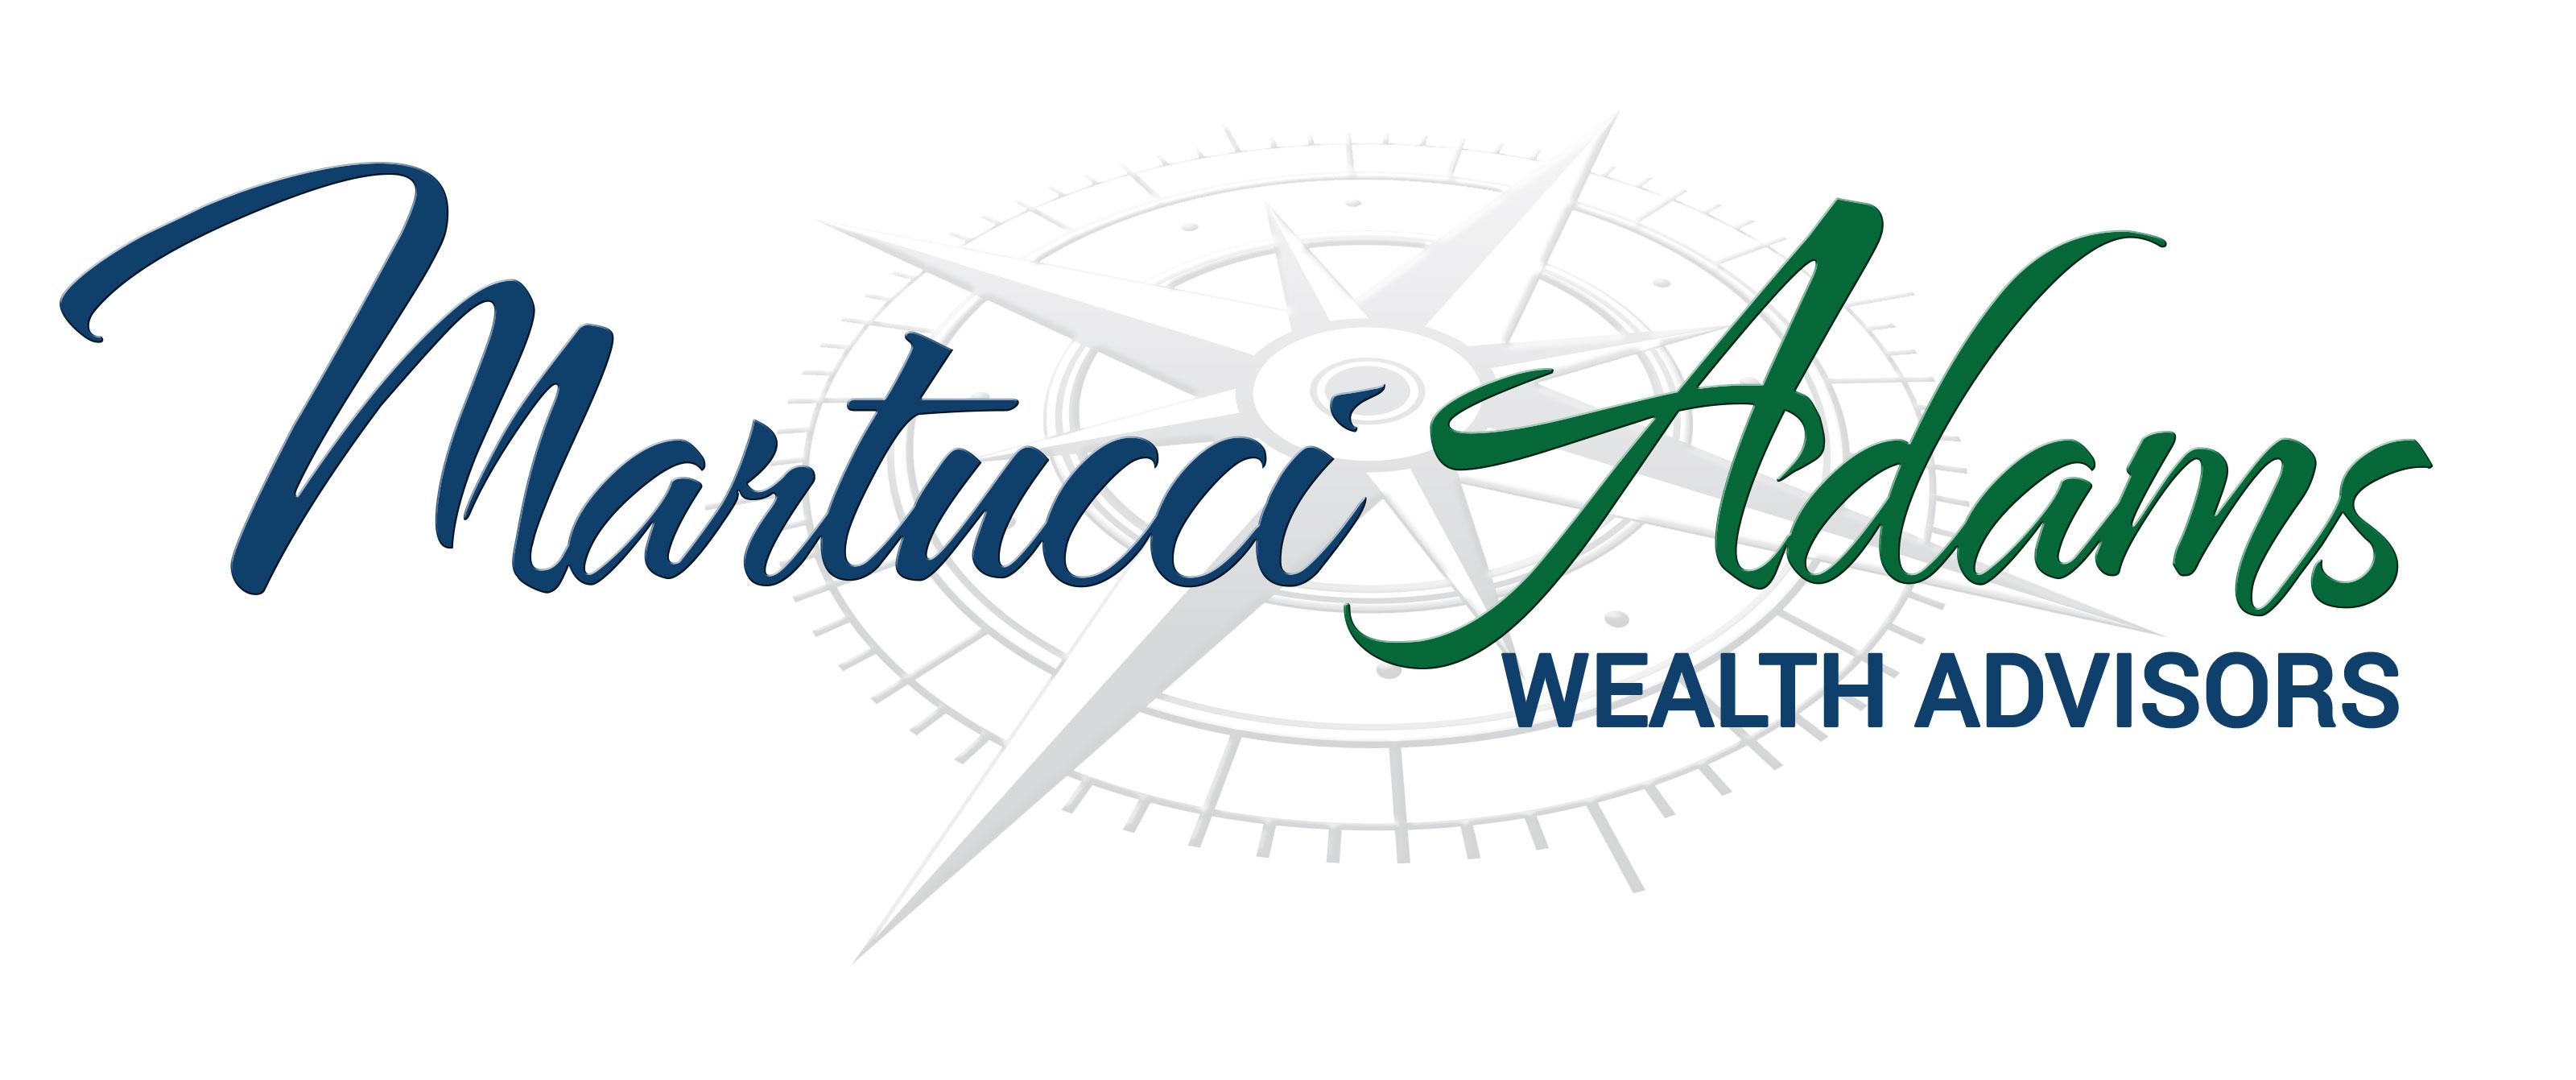 Martucci_Adams_Logo.jpg